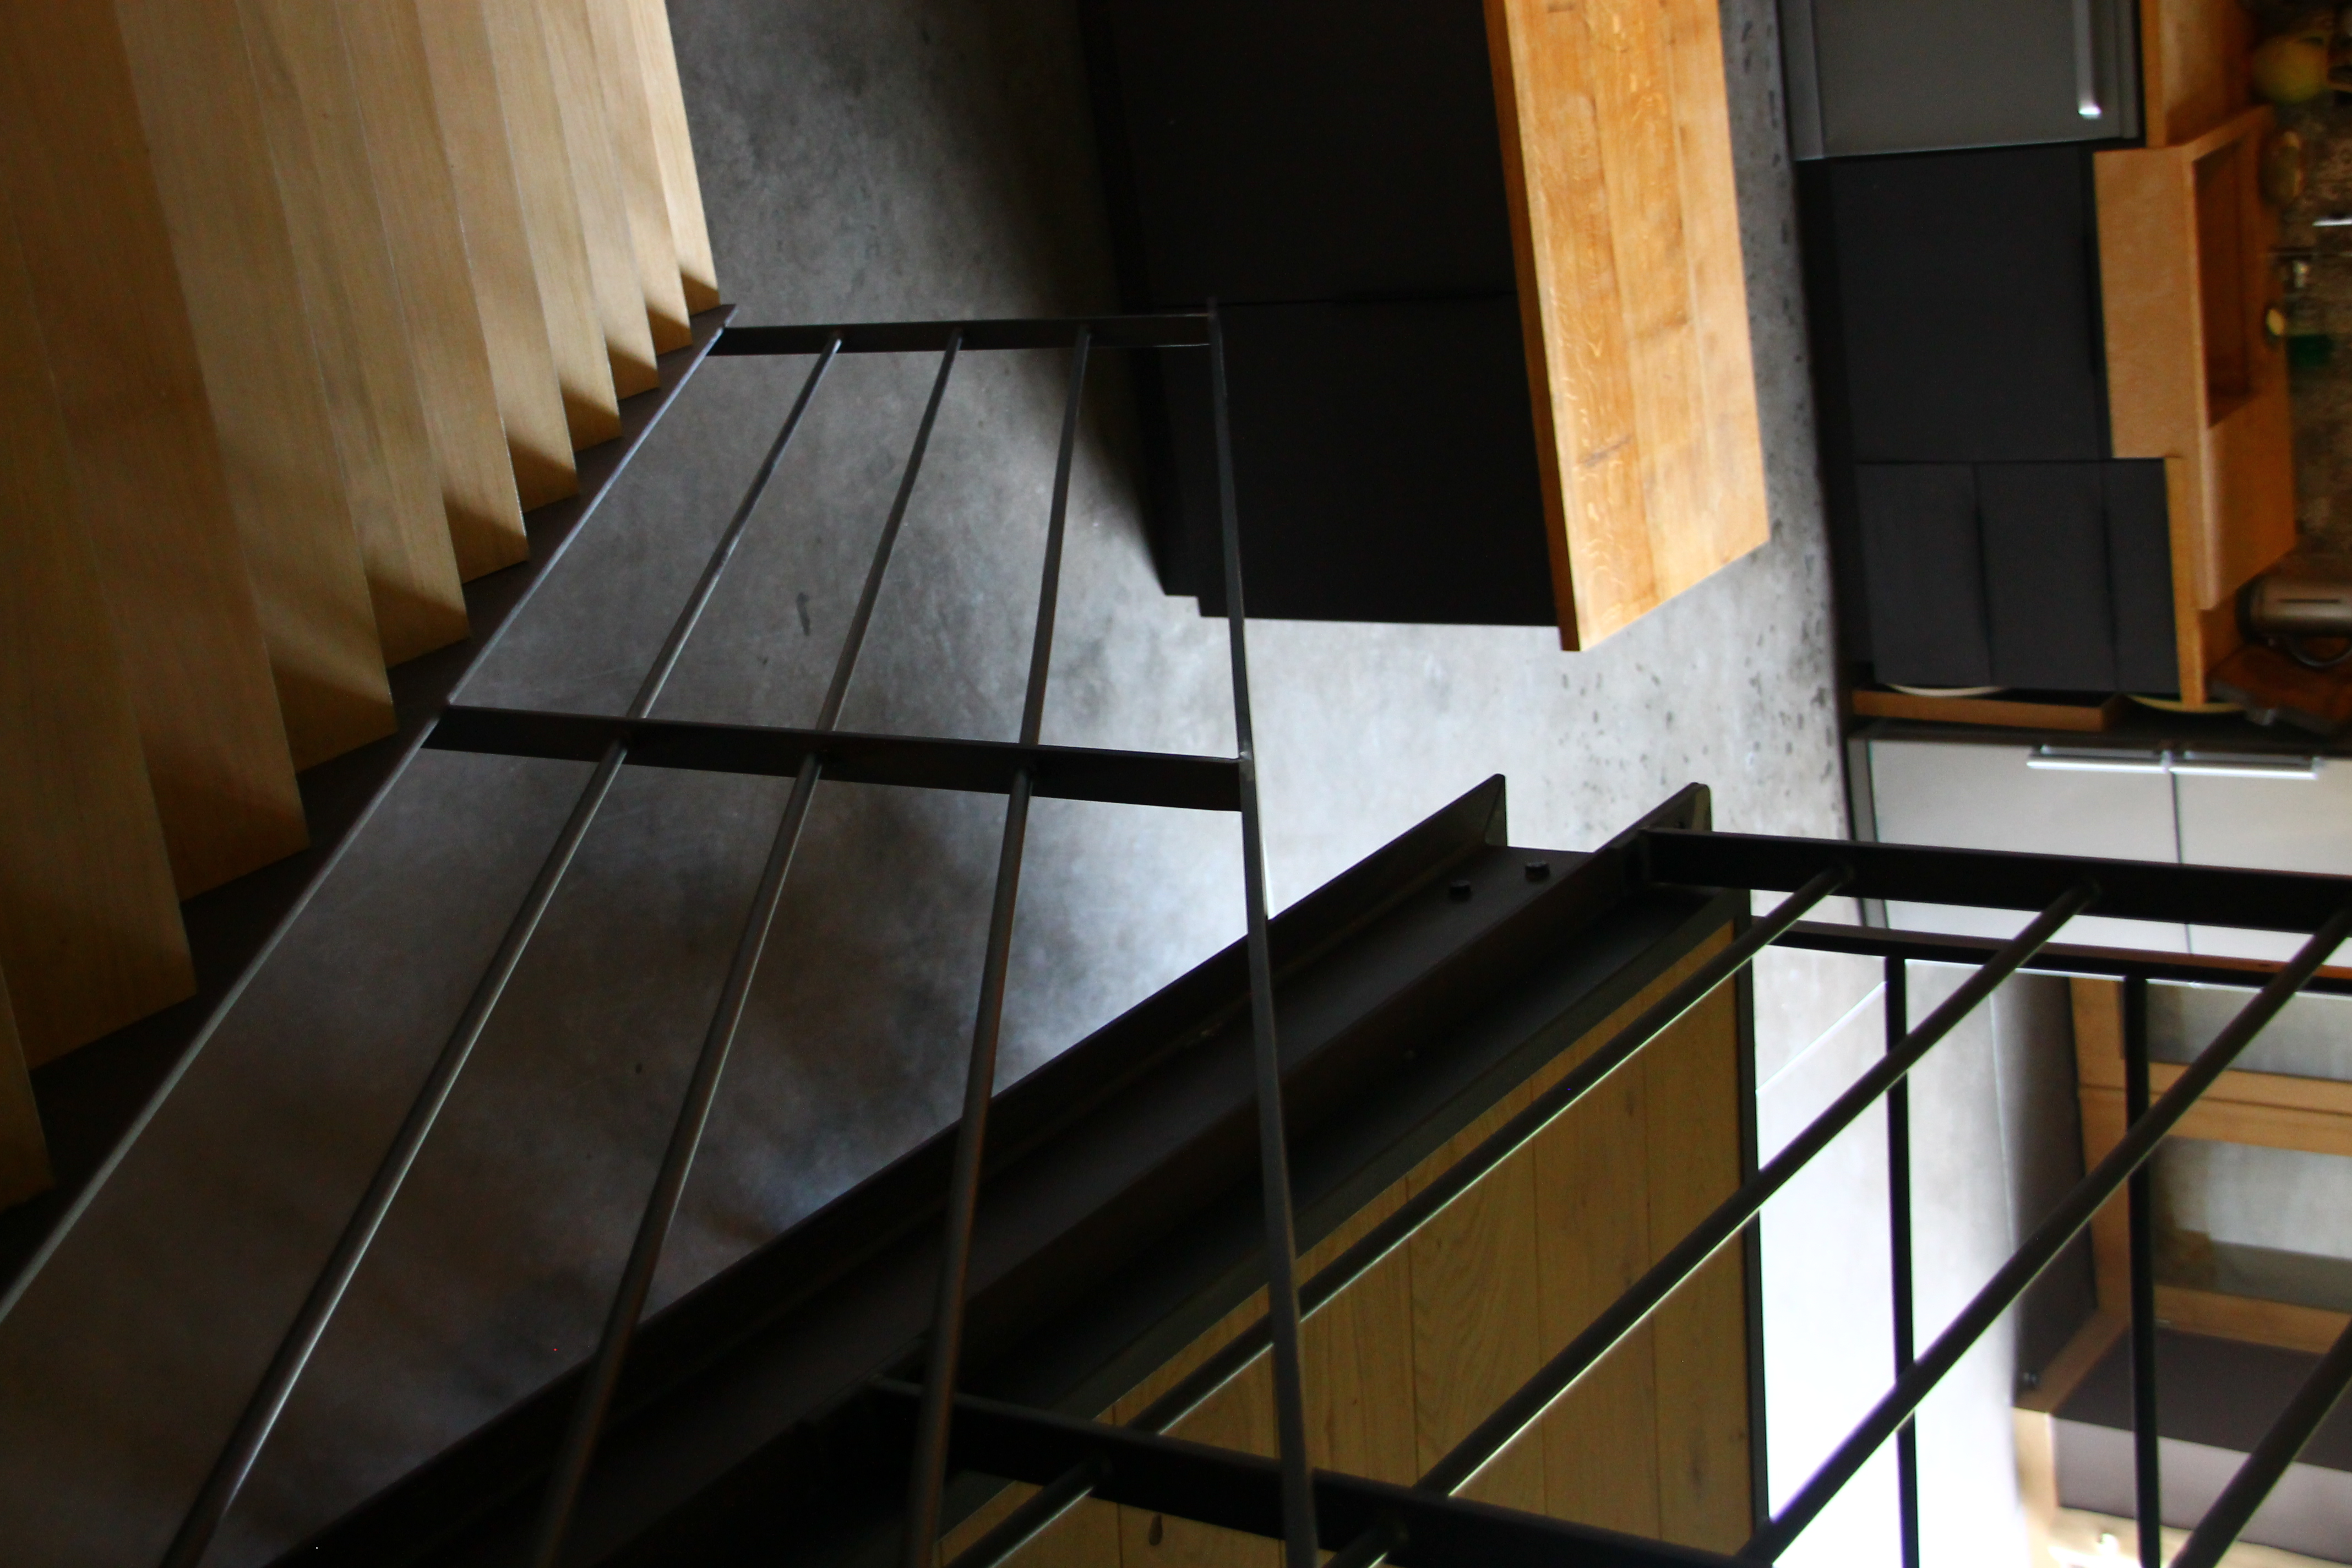 Escalier - Mezzanine